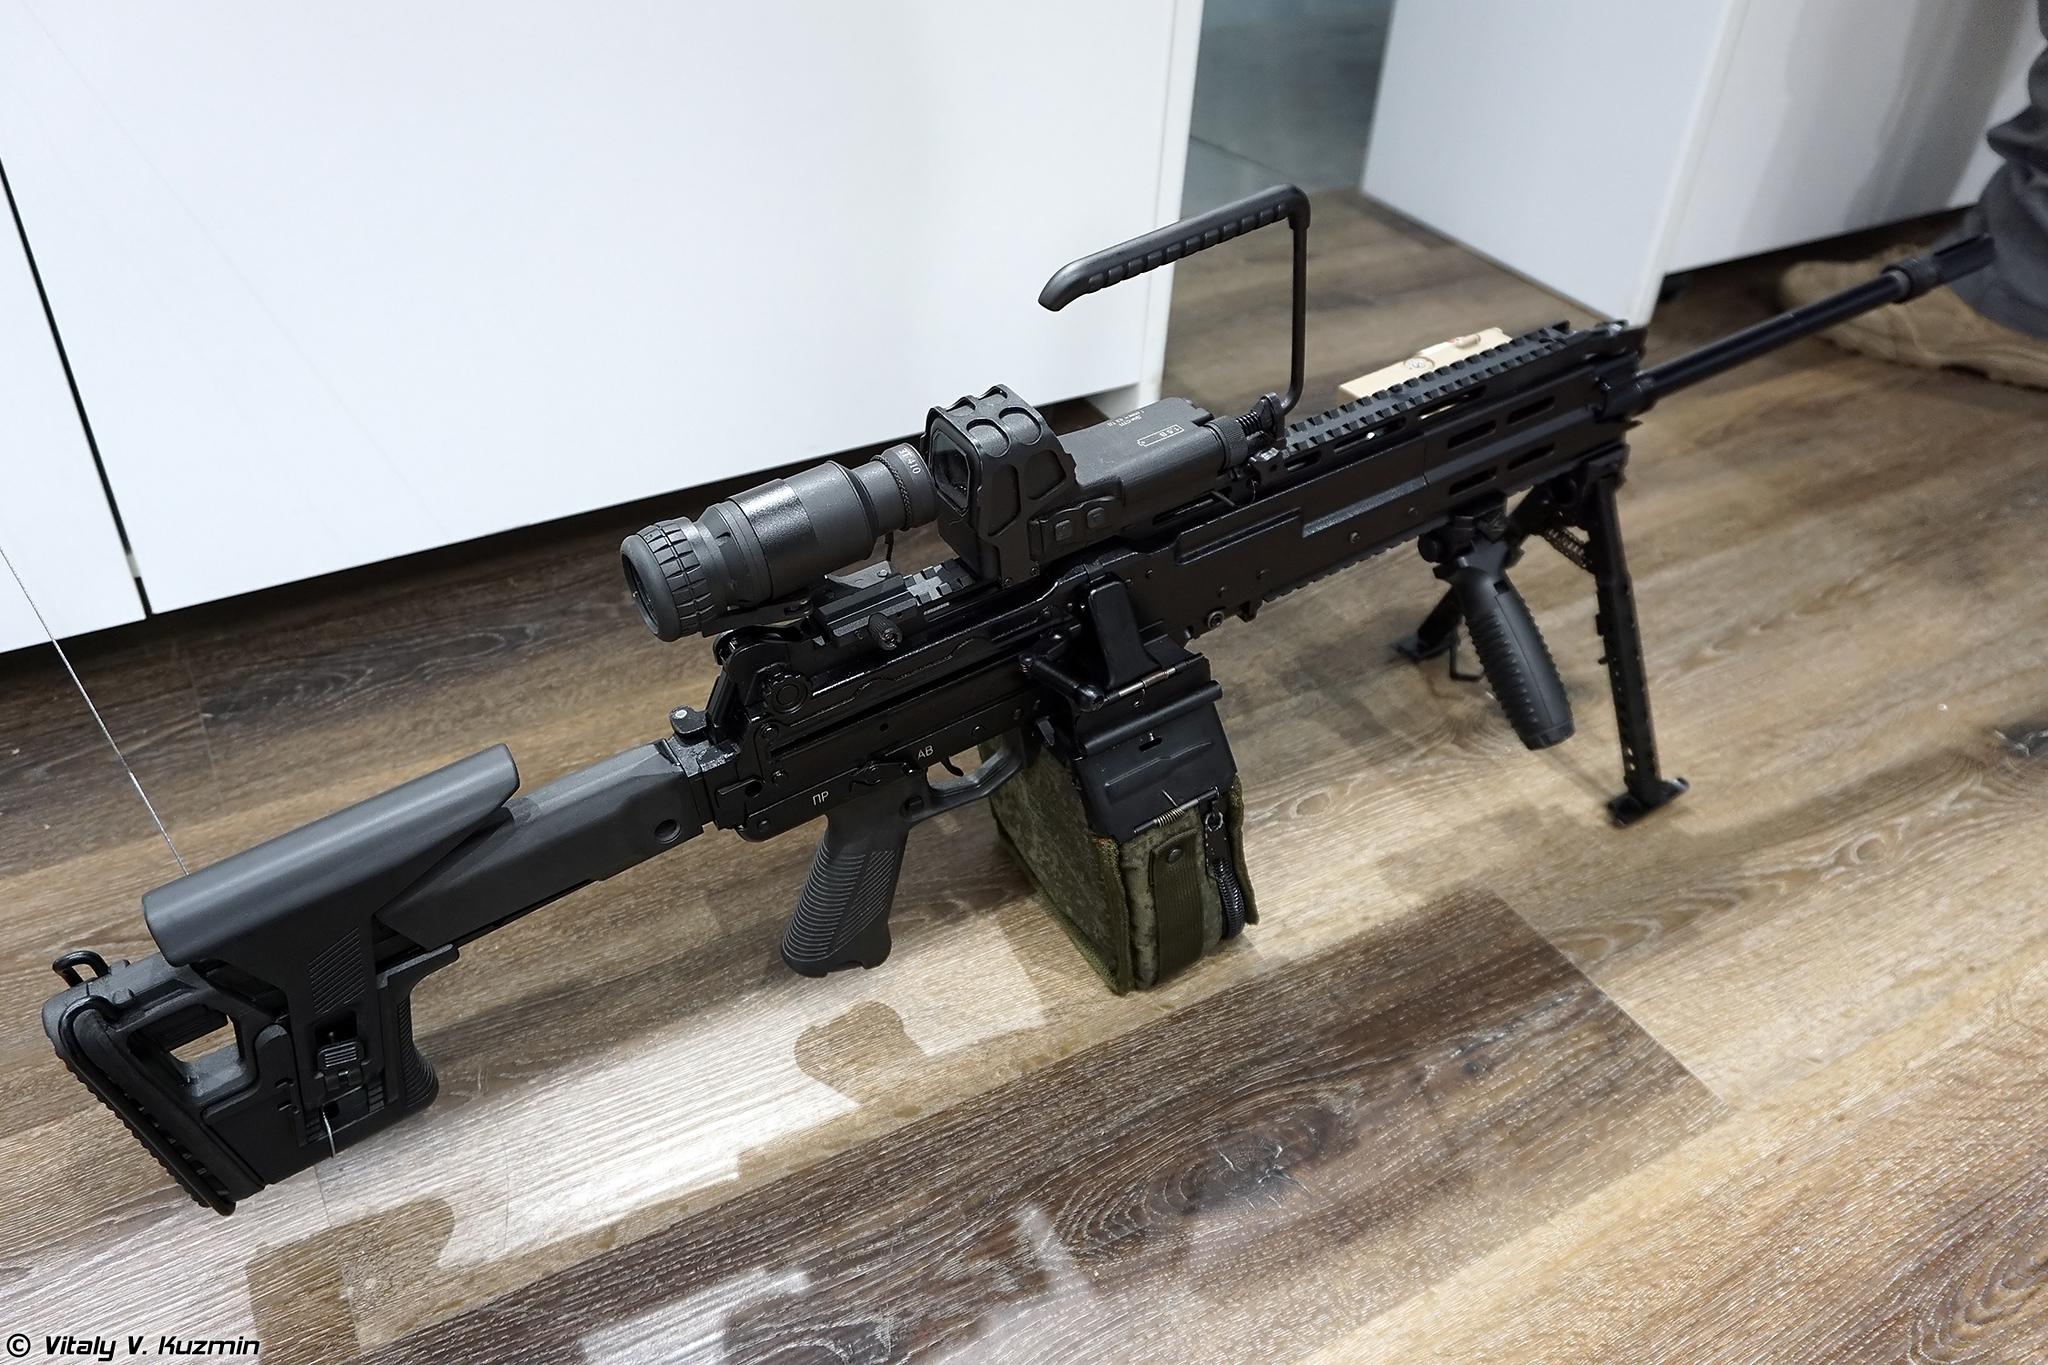 Russian Assault Rifles/Carbines/Machine Guns Thread: #2 - Page 10 Army-2020-Pavilions-003-X4